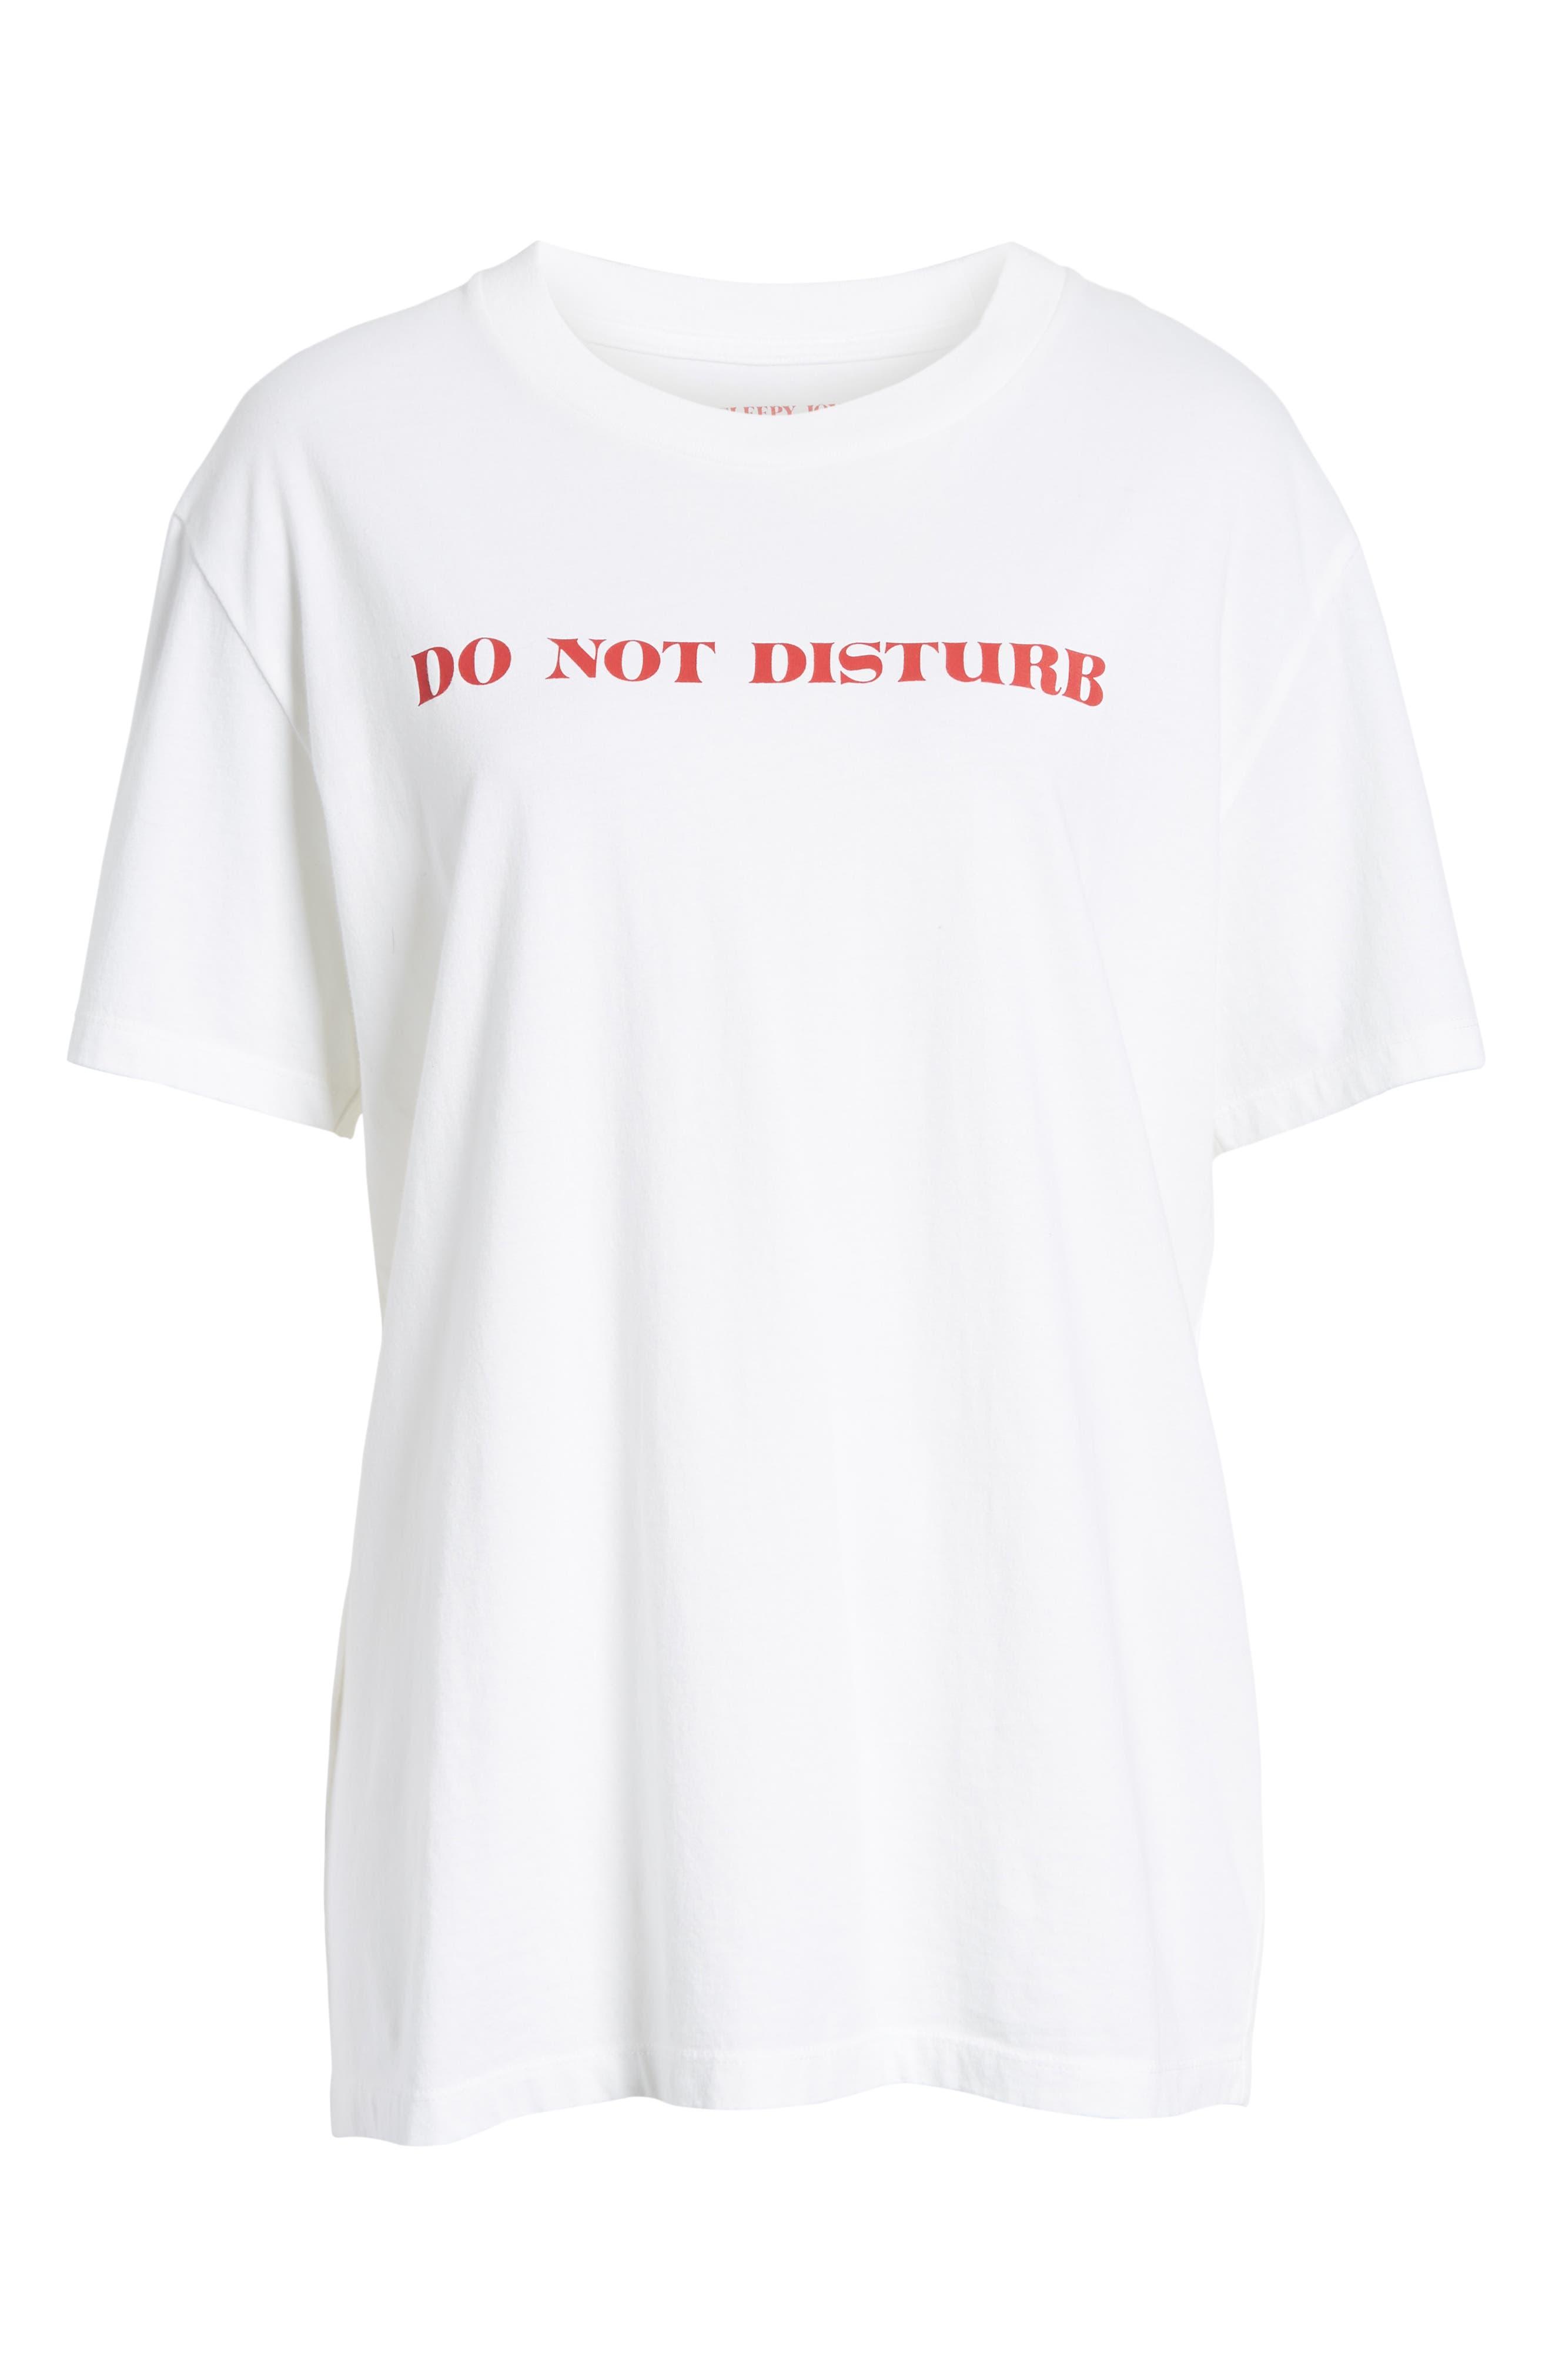 Do Not Disturb Tee,                             Alternate thumbnail 6, color,                             WHITE